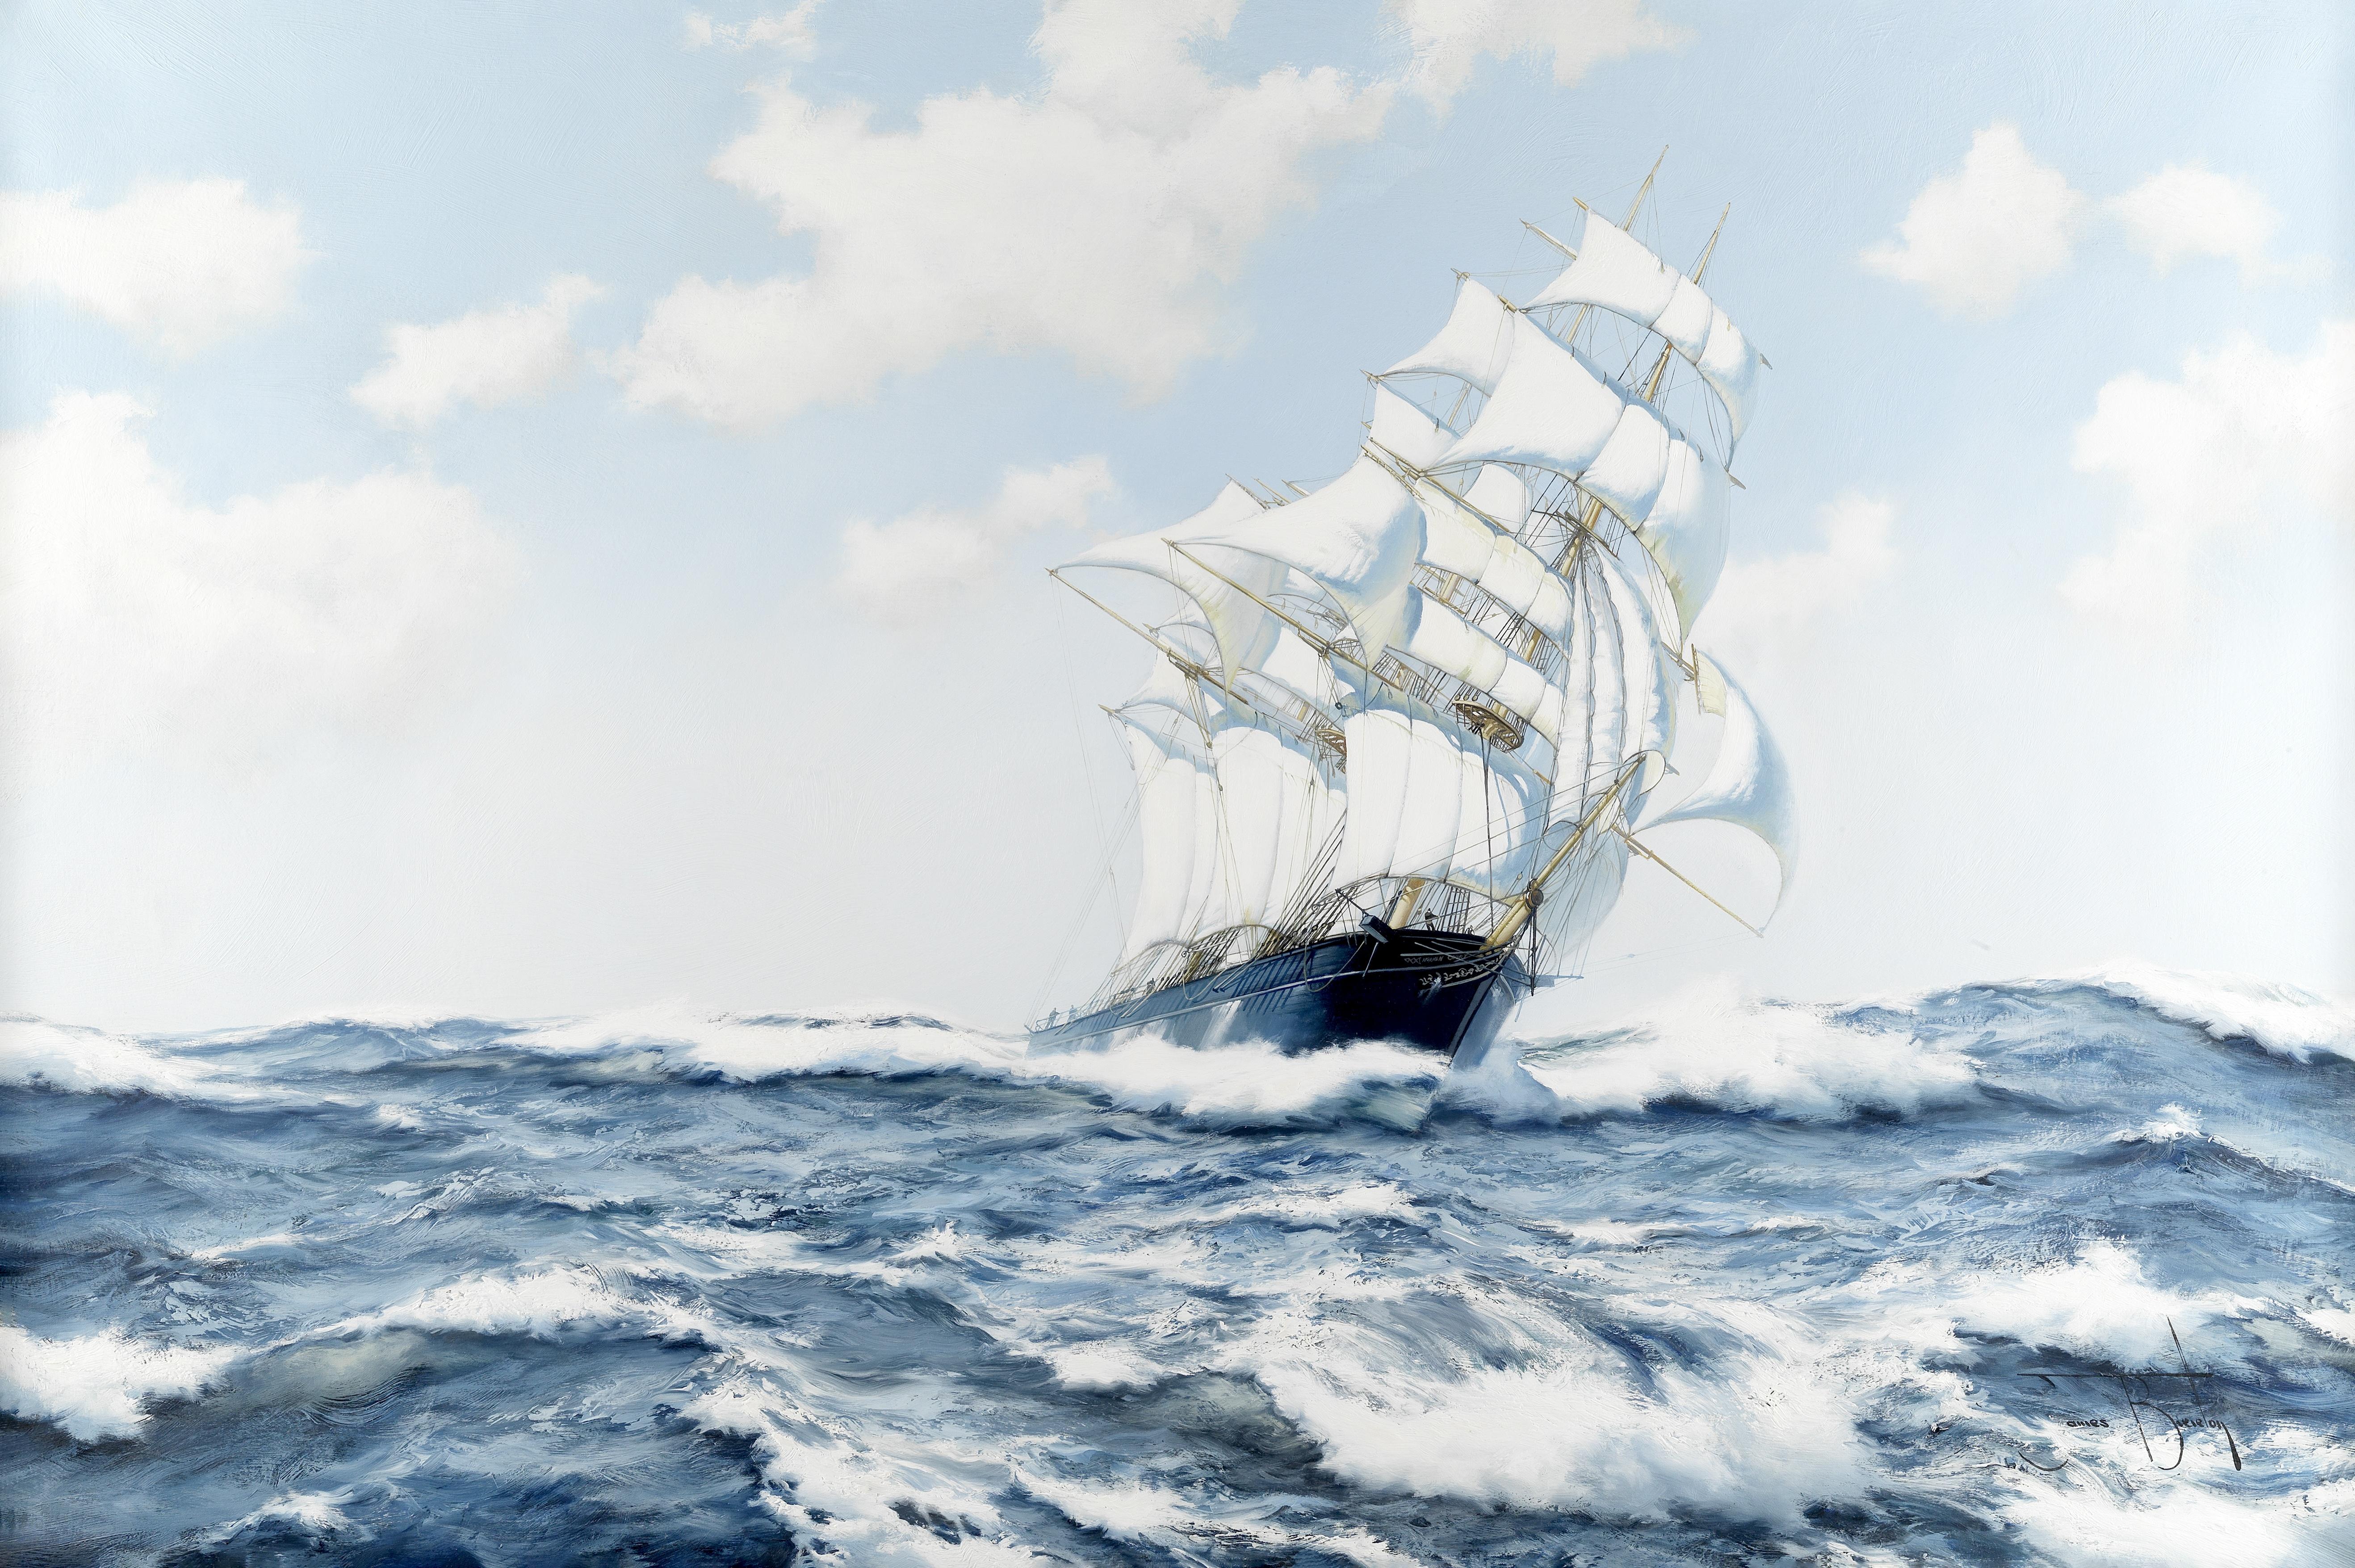 James Brereton (British, born 1954) 'Summer Seas - The Norman Court'